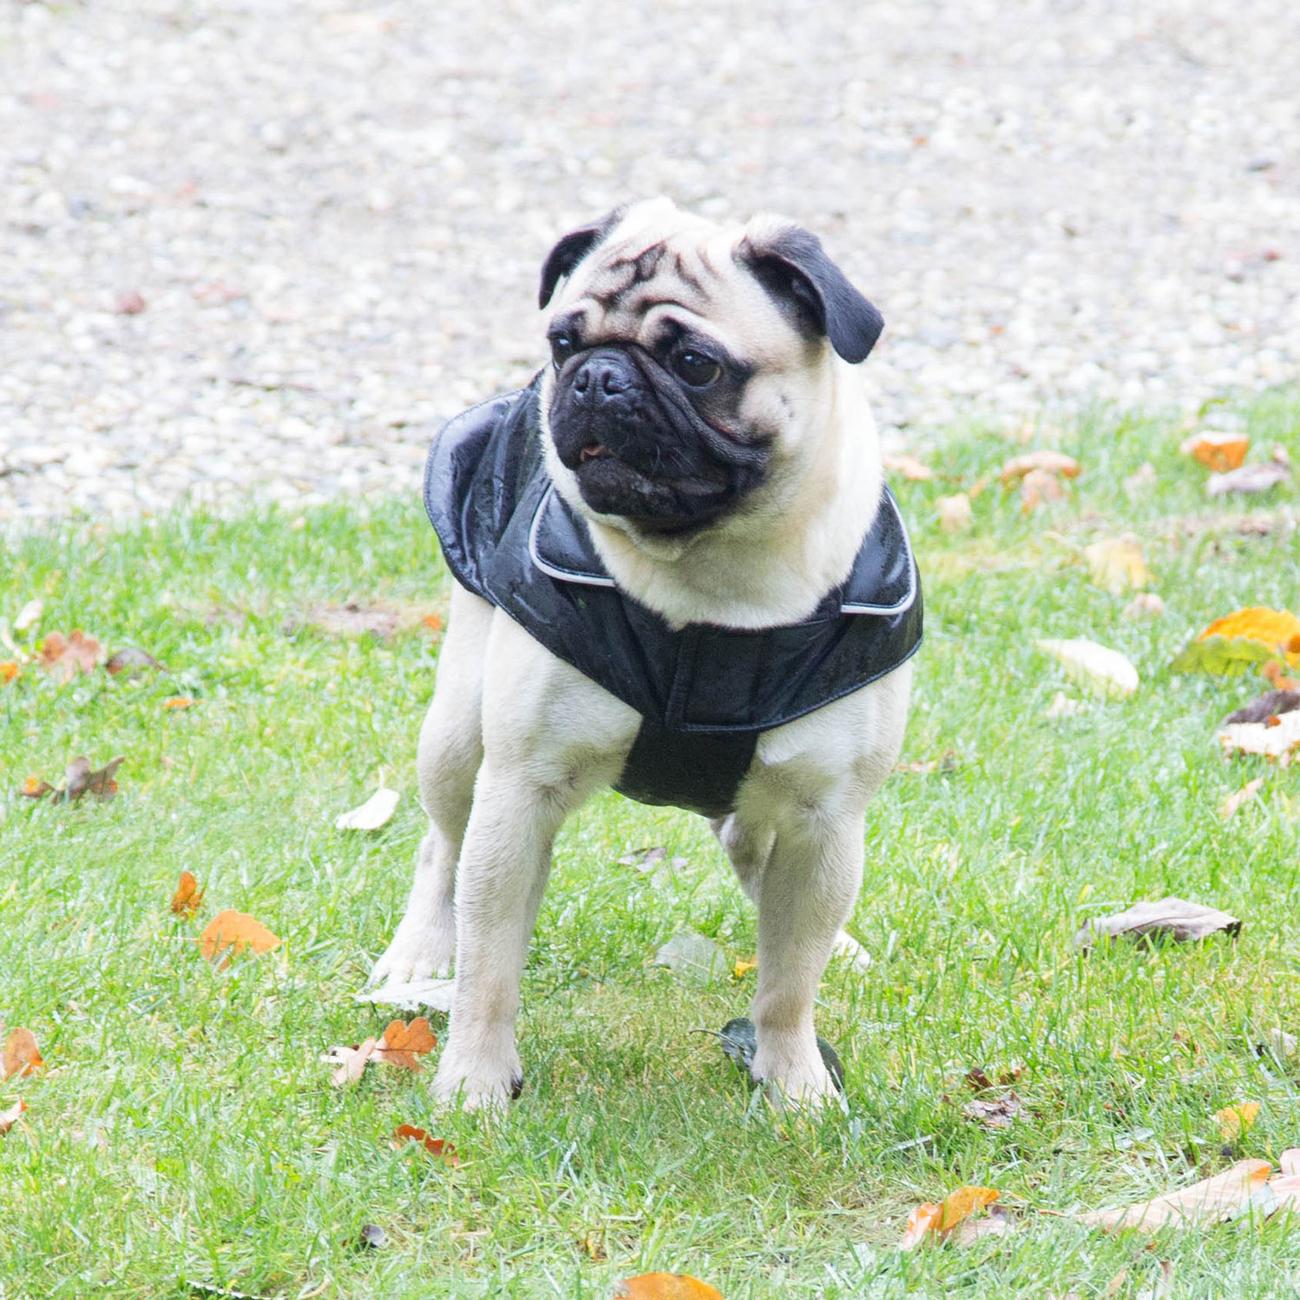 Wolters Hundemantel Outdoorjacke Jack für Mops & Co, Bild 4